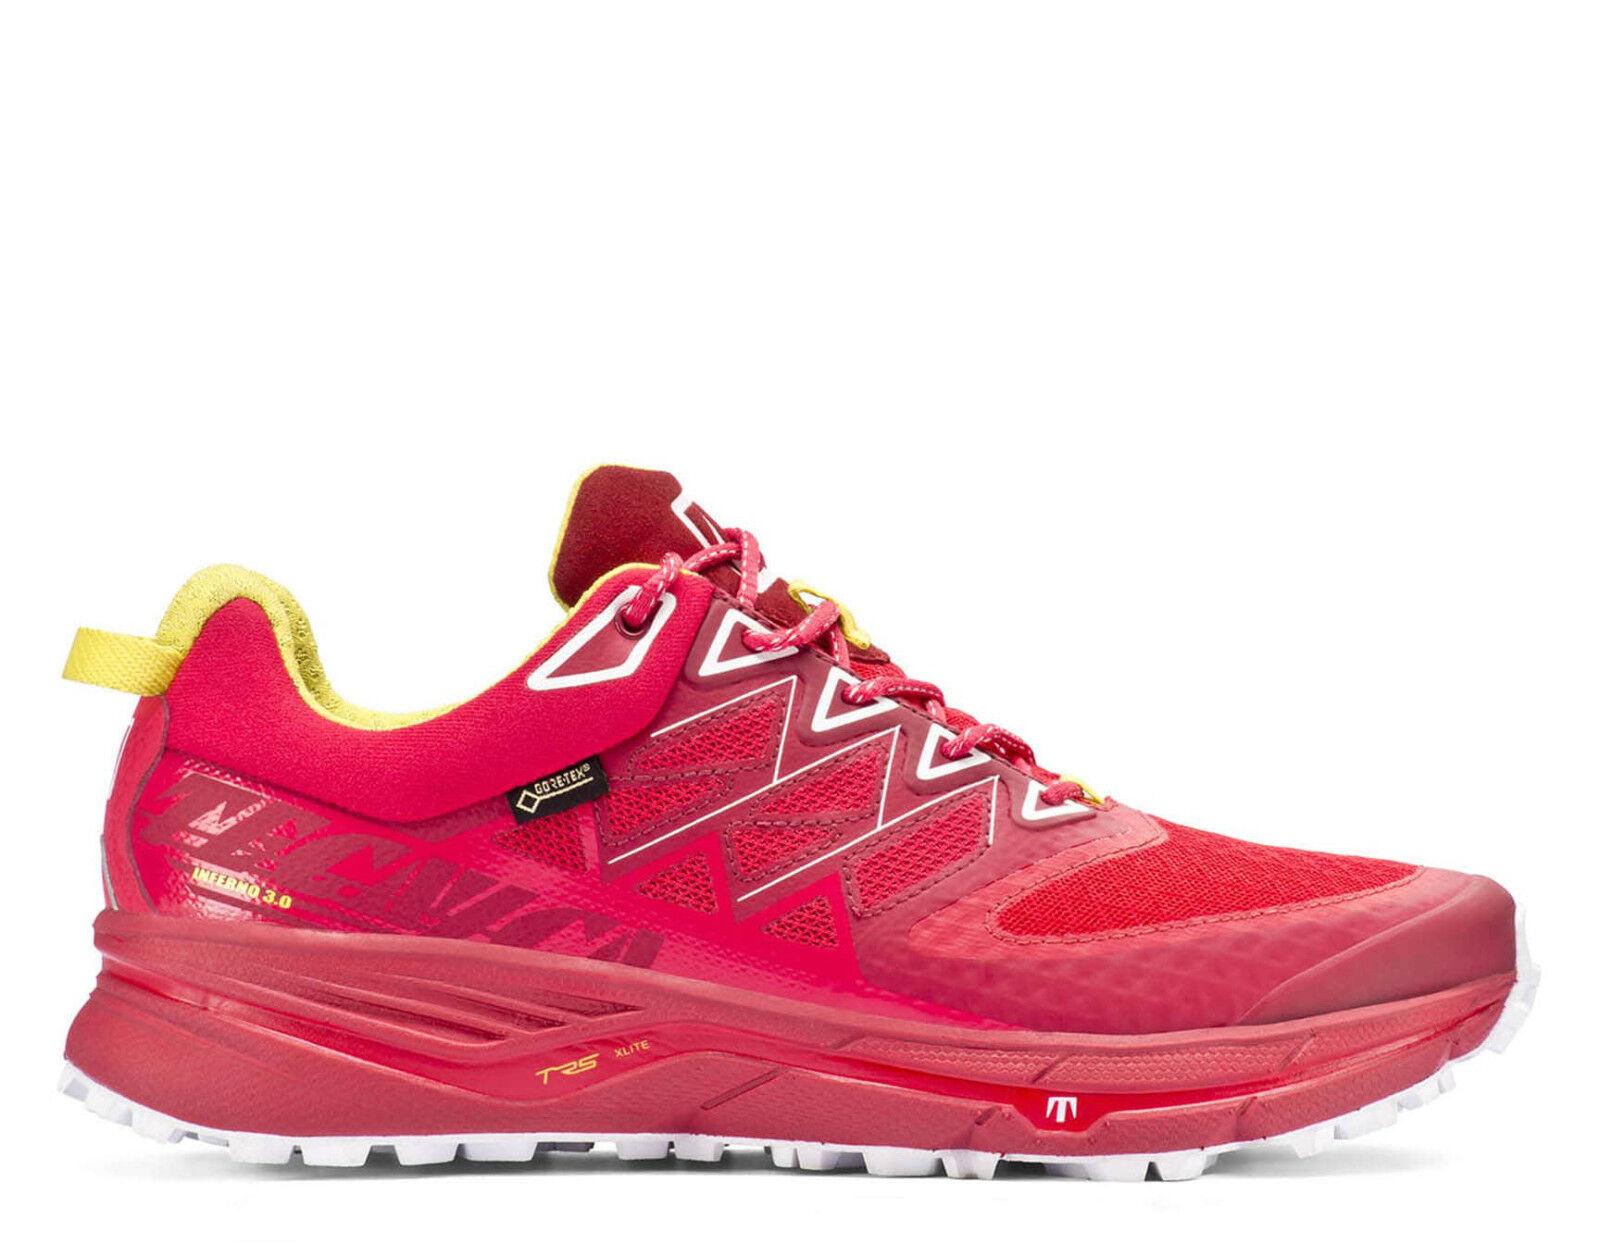 Tecnica trailschuh Inferno xlite 3.0 UE us 7 zapato rosadodo señora MN j18